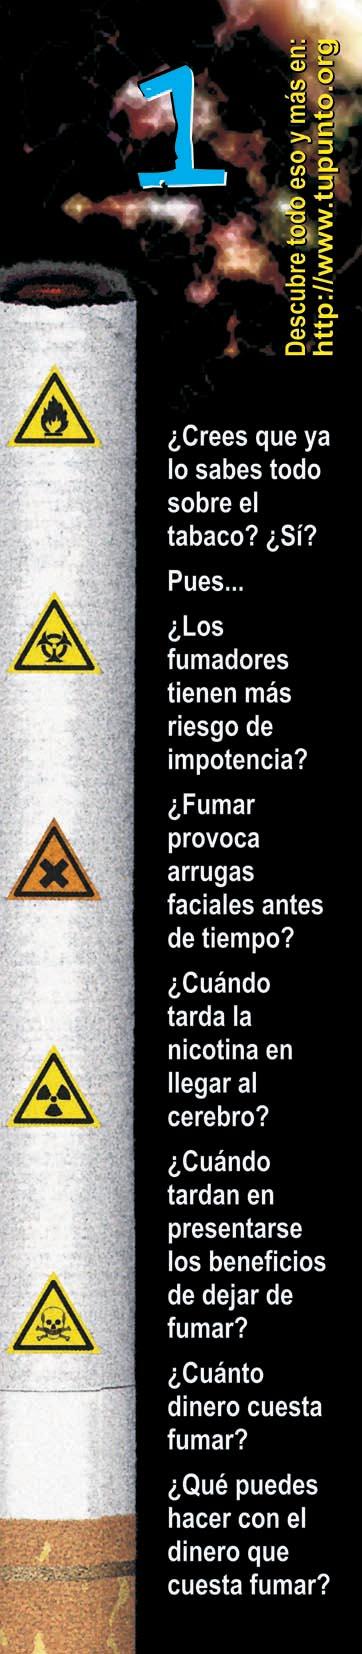 Punts07 castellano a 1